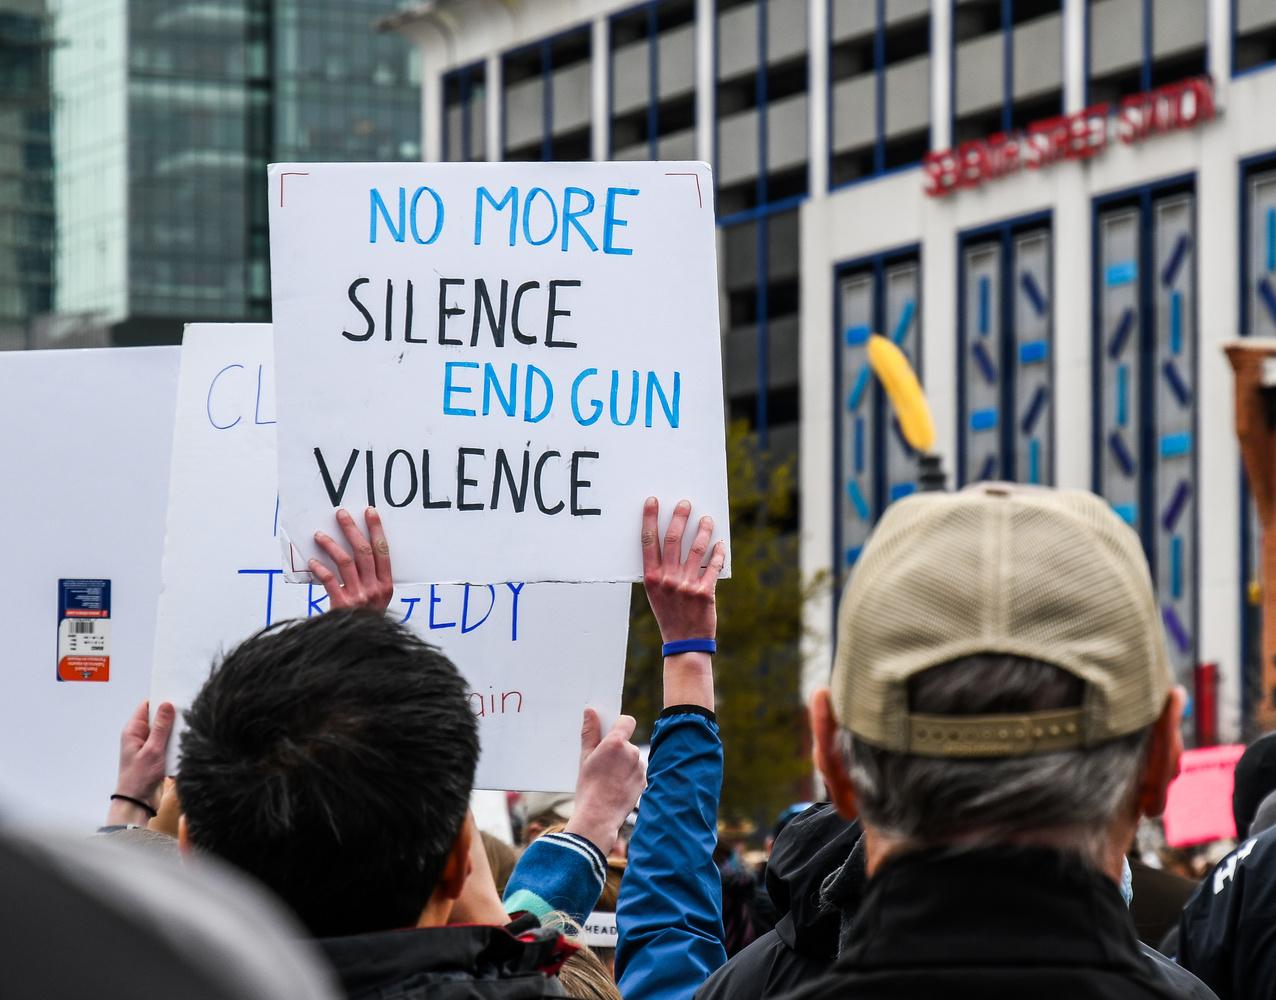 No More Silence End Gun Violence by Katherine Kosmicki